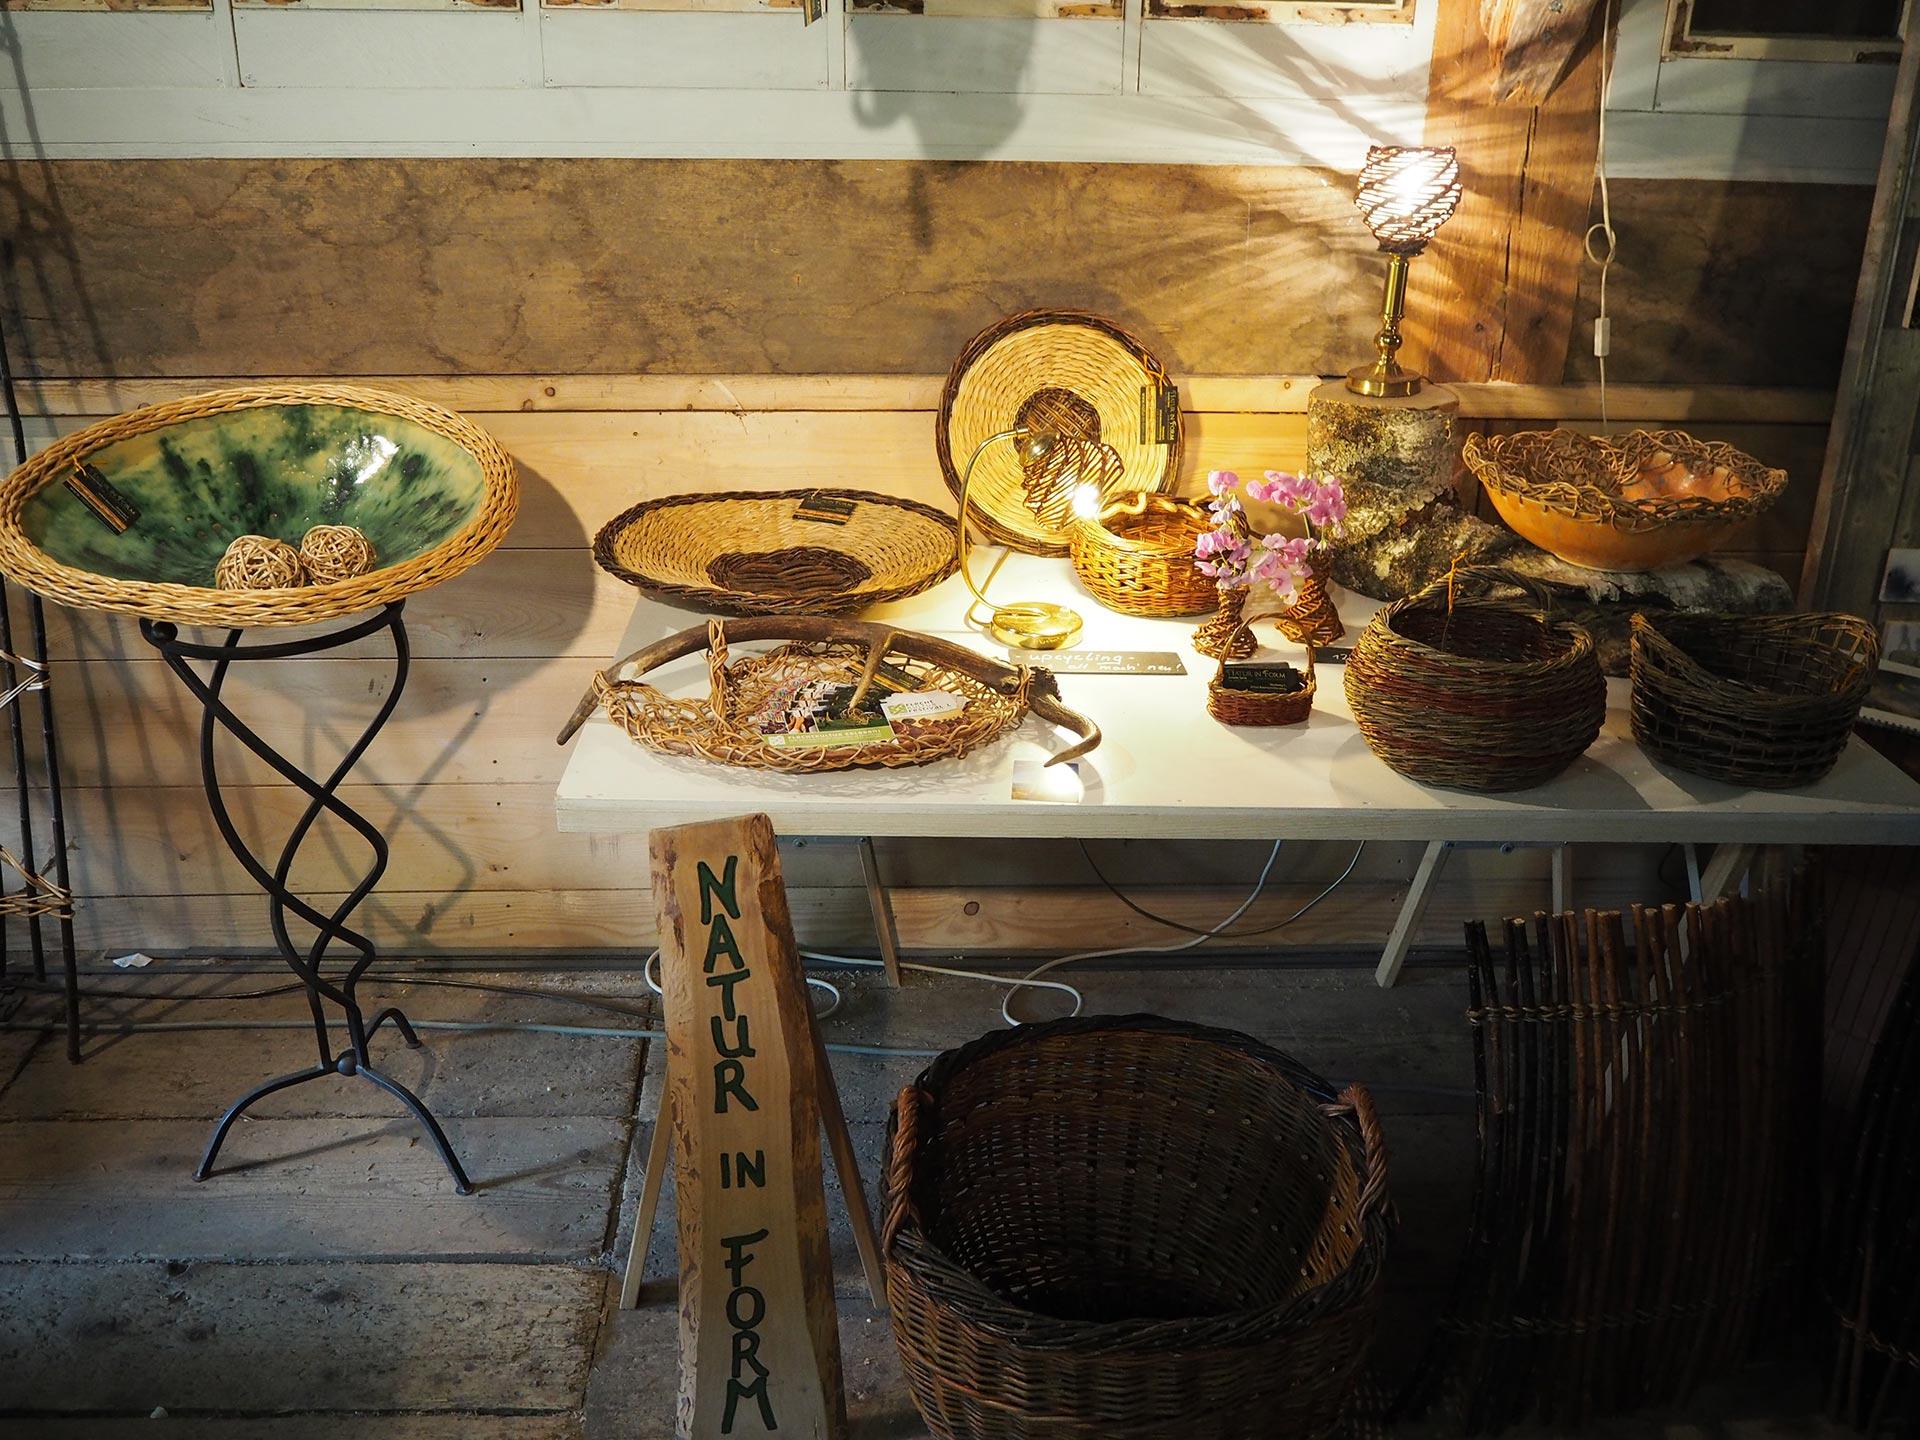 termine natur in form. Black Bedroom Furniture Sets. Home Design Ideas